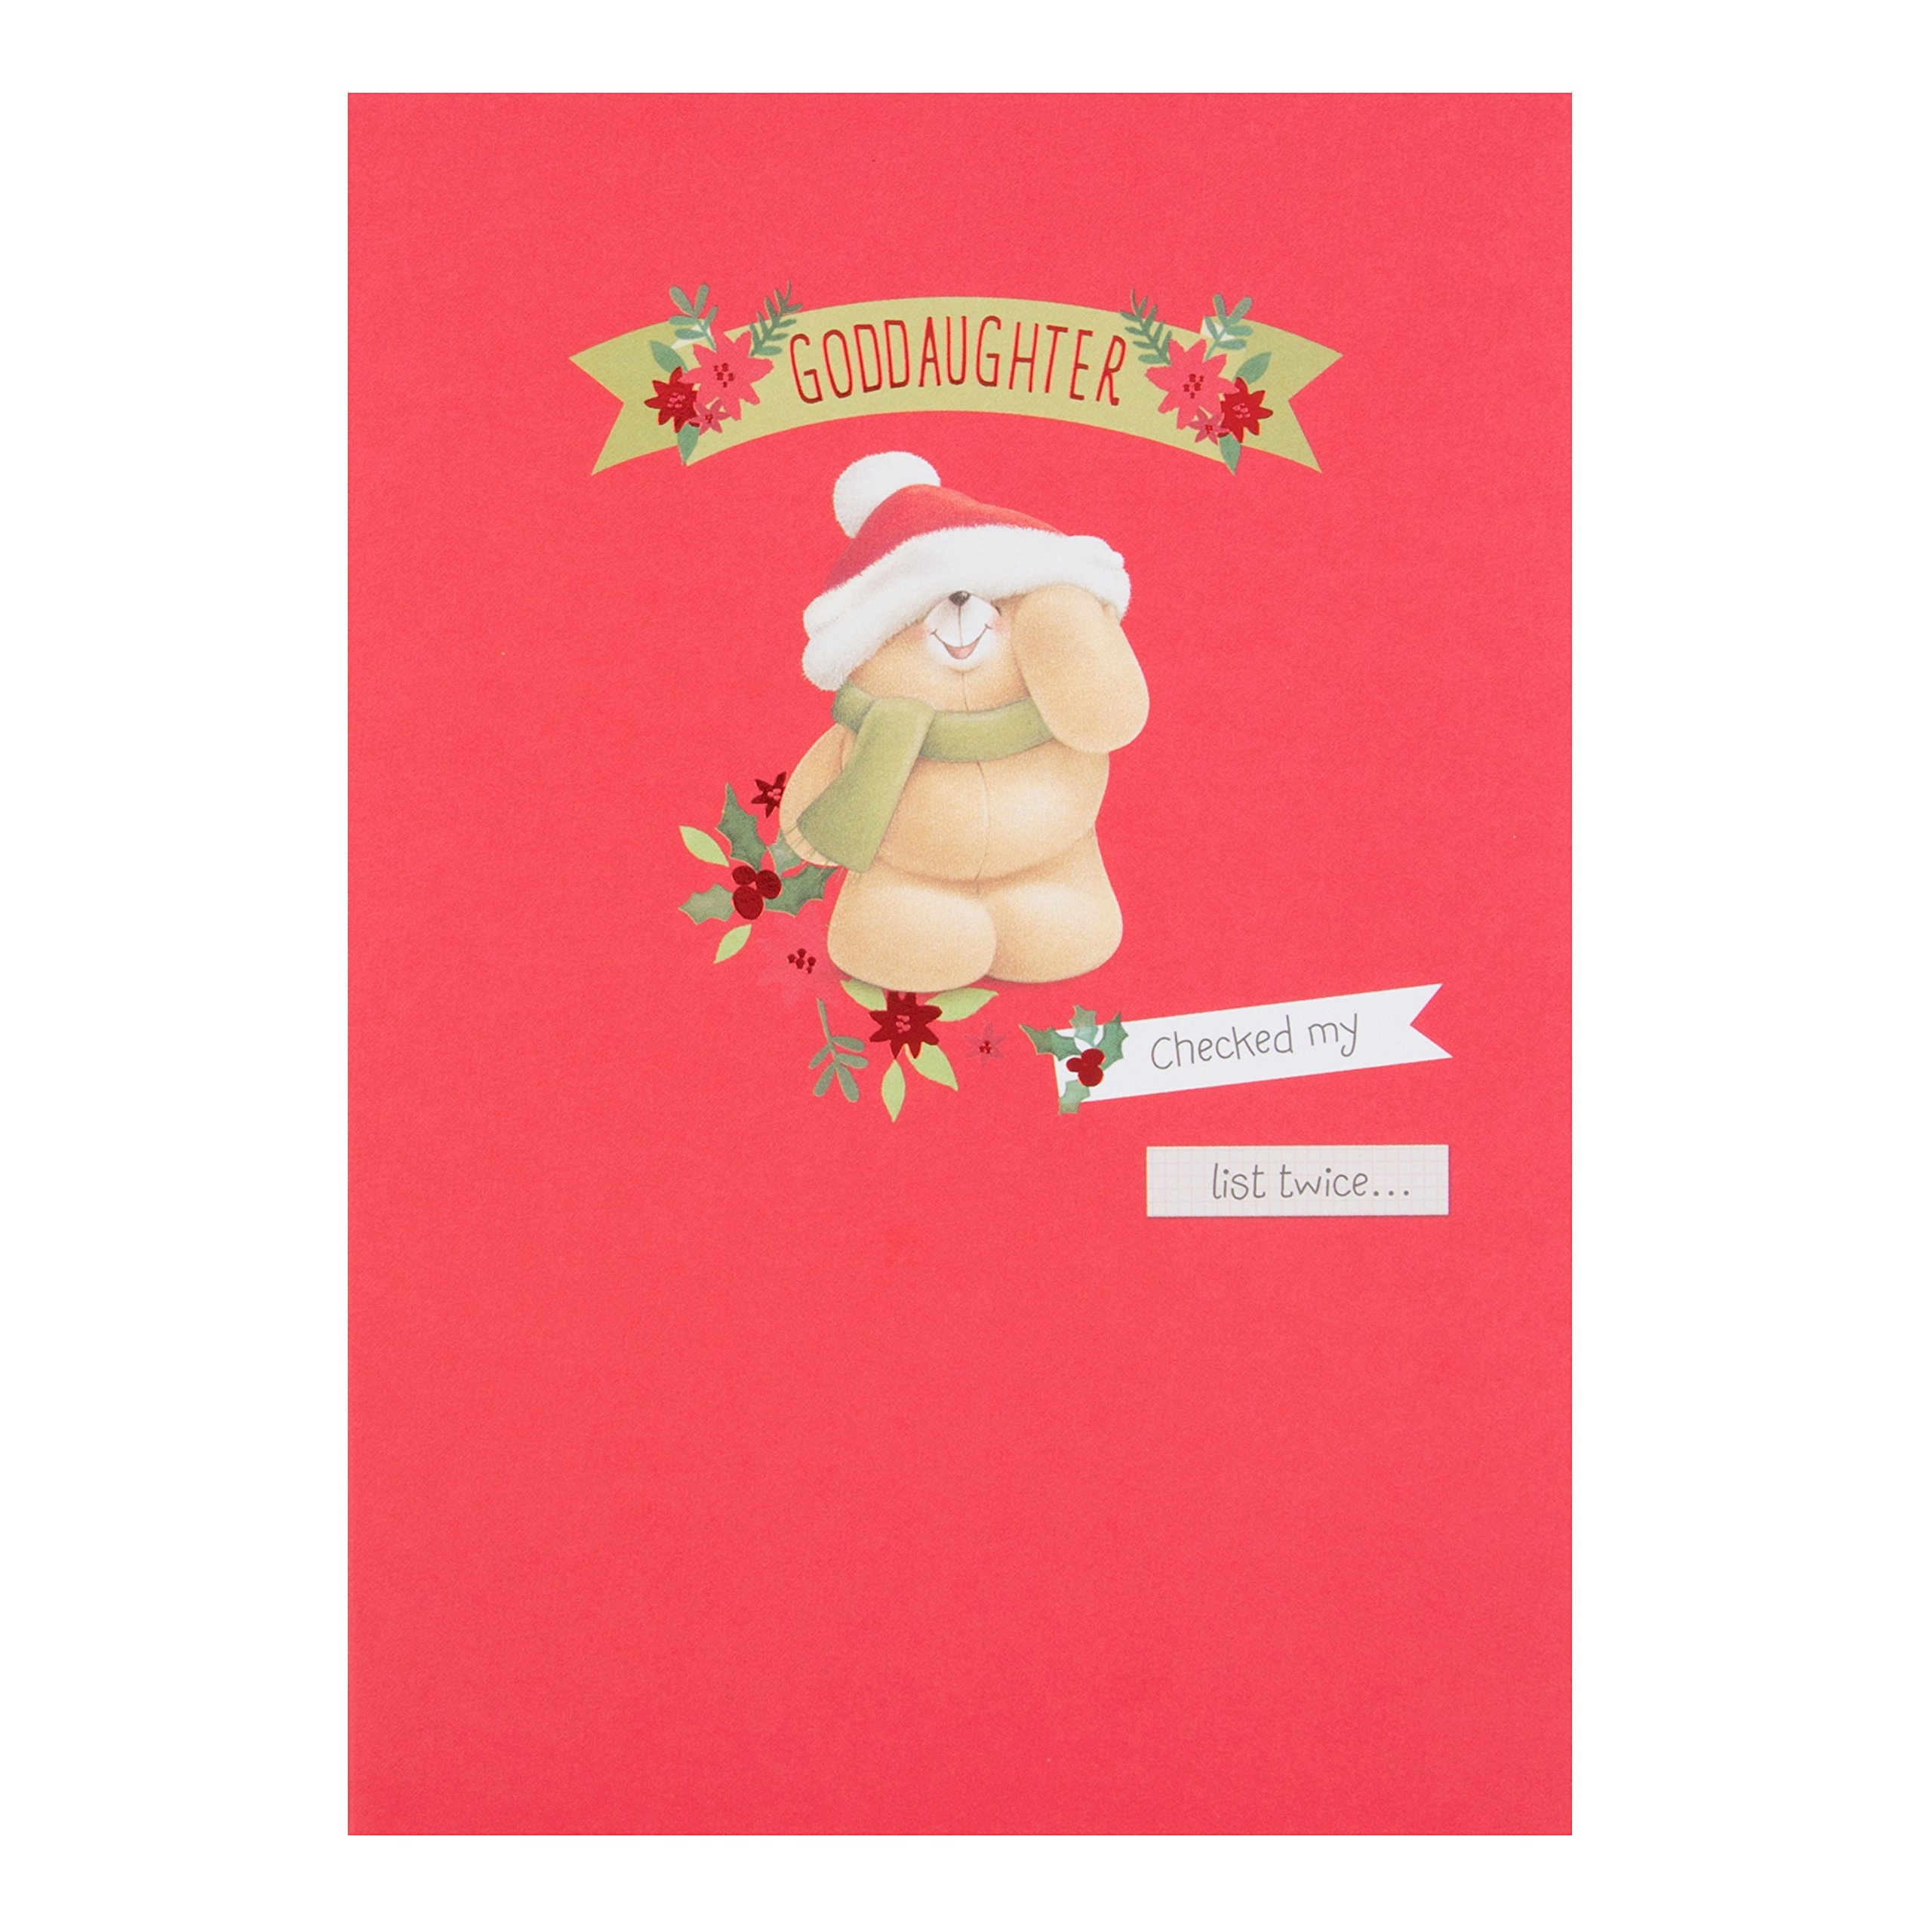 Christmas Card For Her Amazon